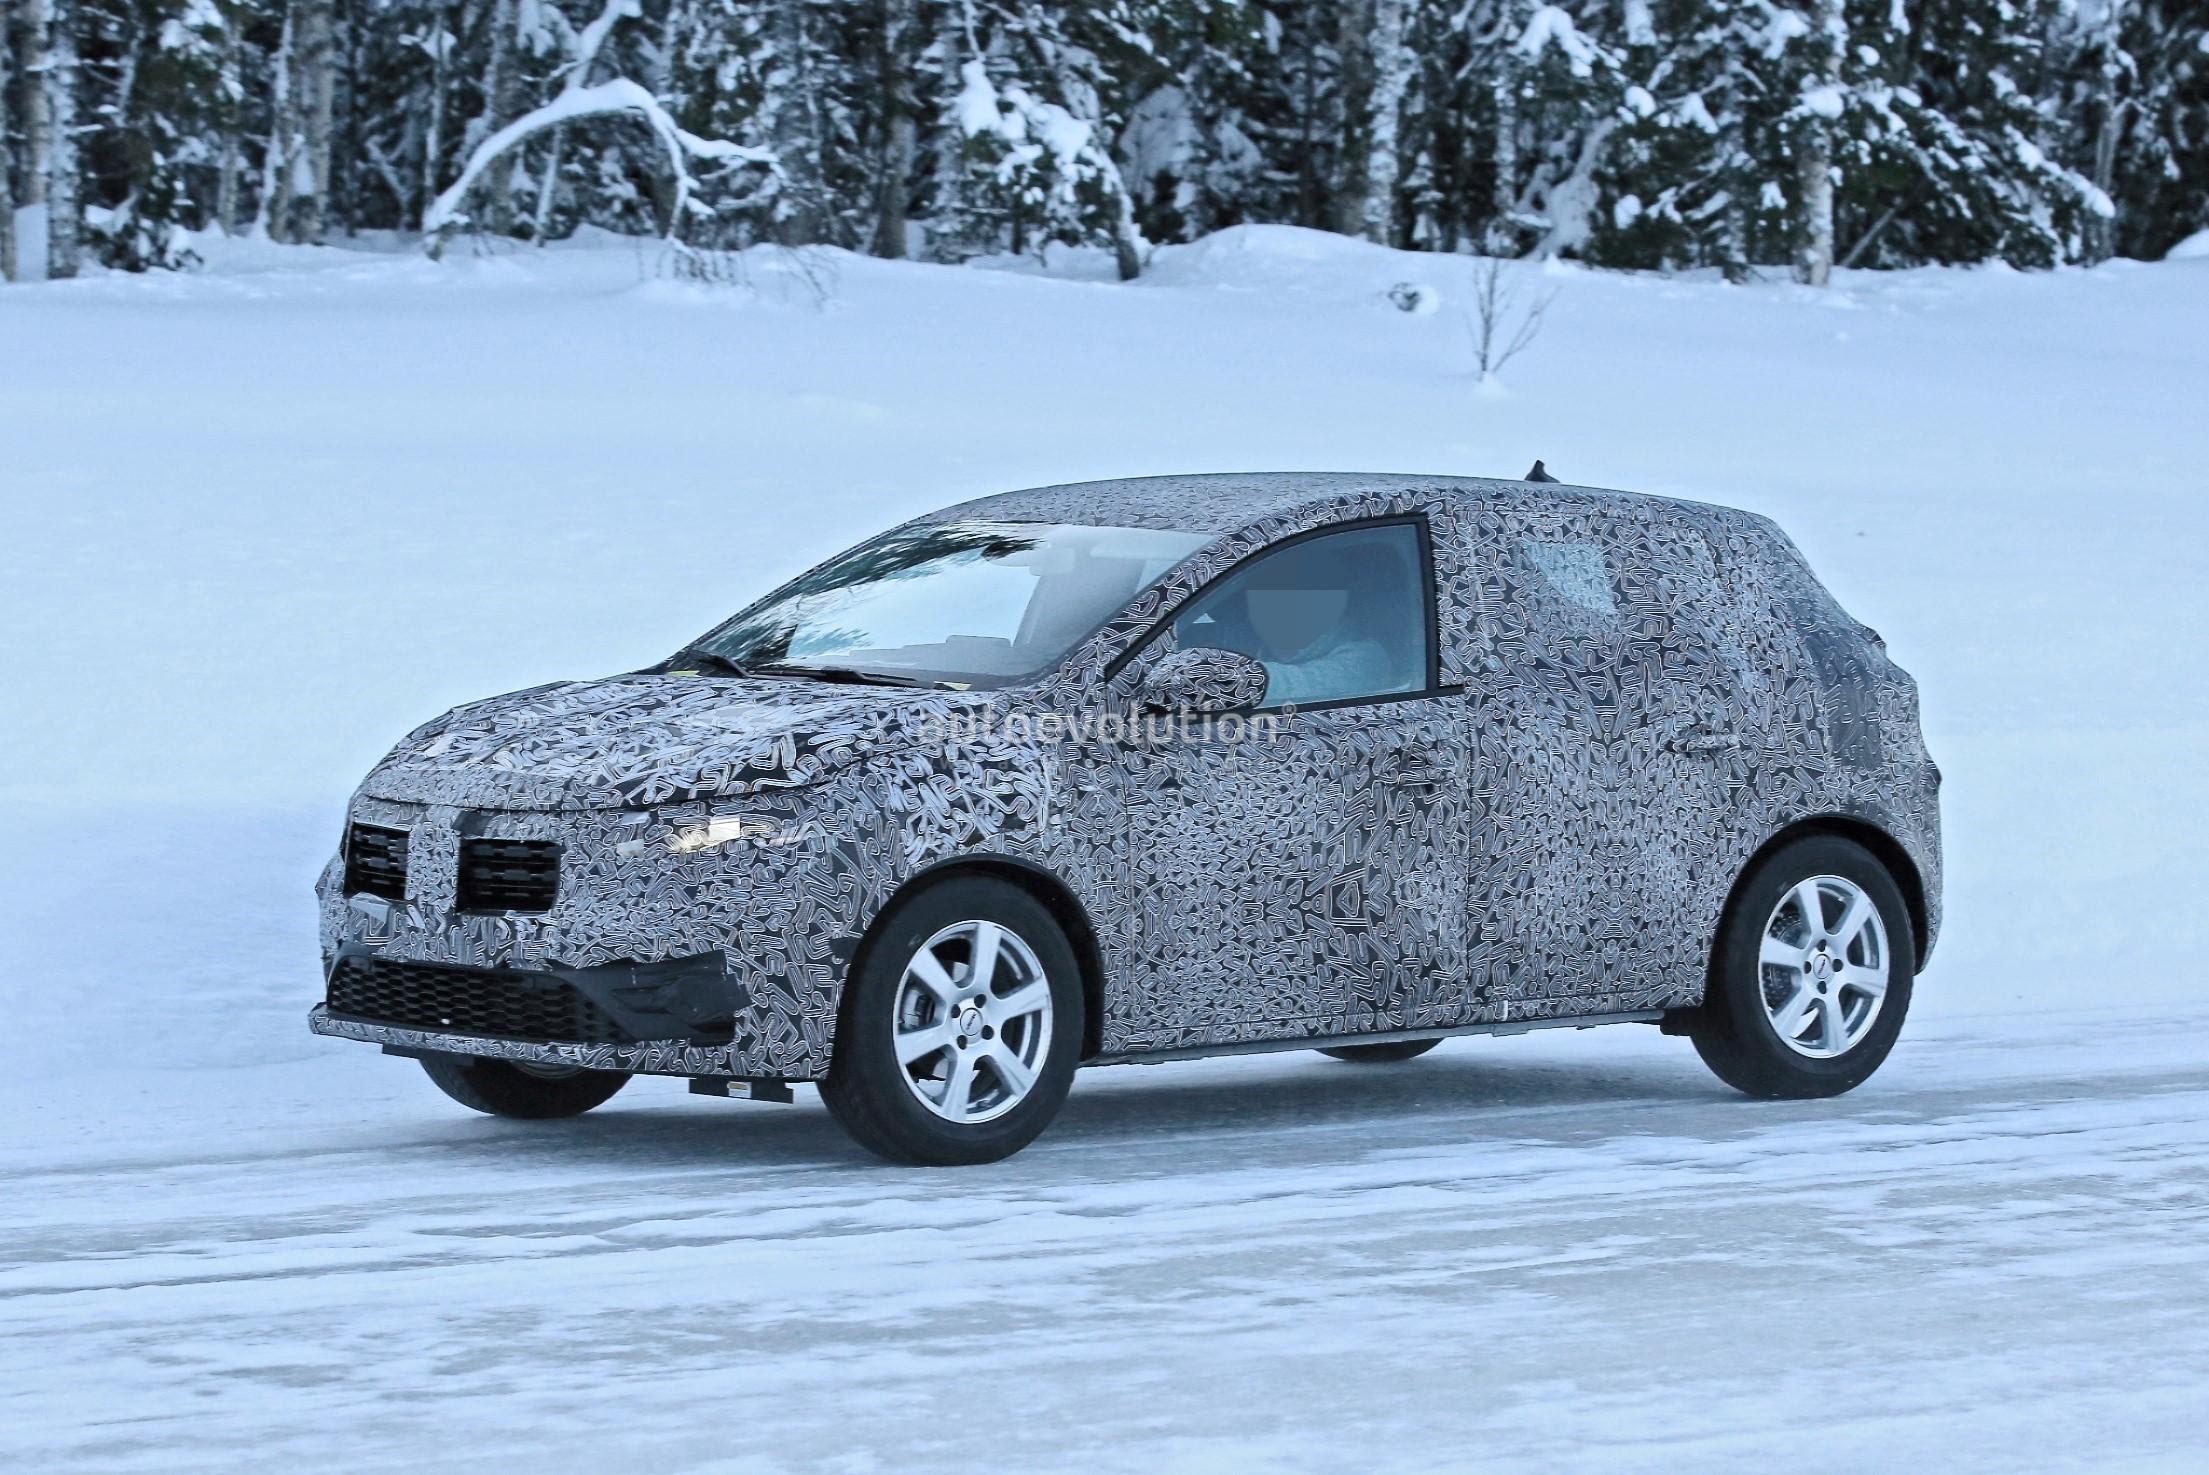 Emissions Test Utah >> 2021 Dacia Sandero Prototype Features New Infotainment System, Rear Drum Brakes - autoevolution